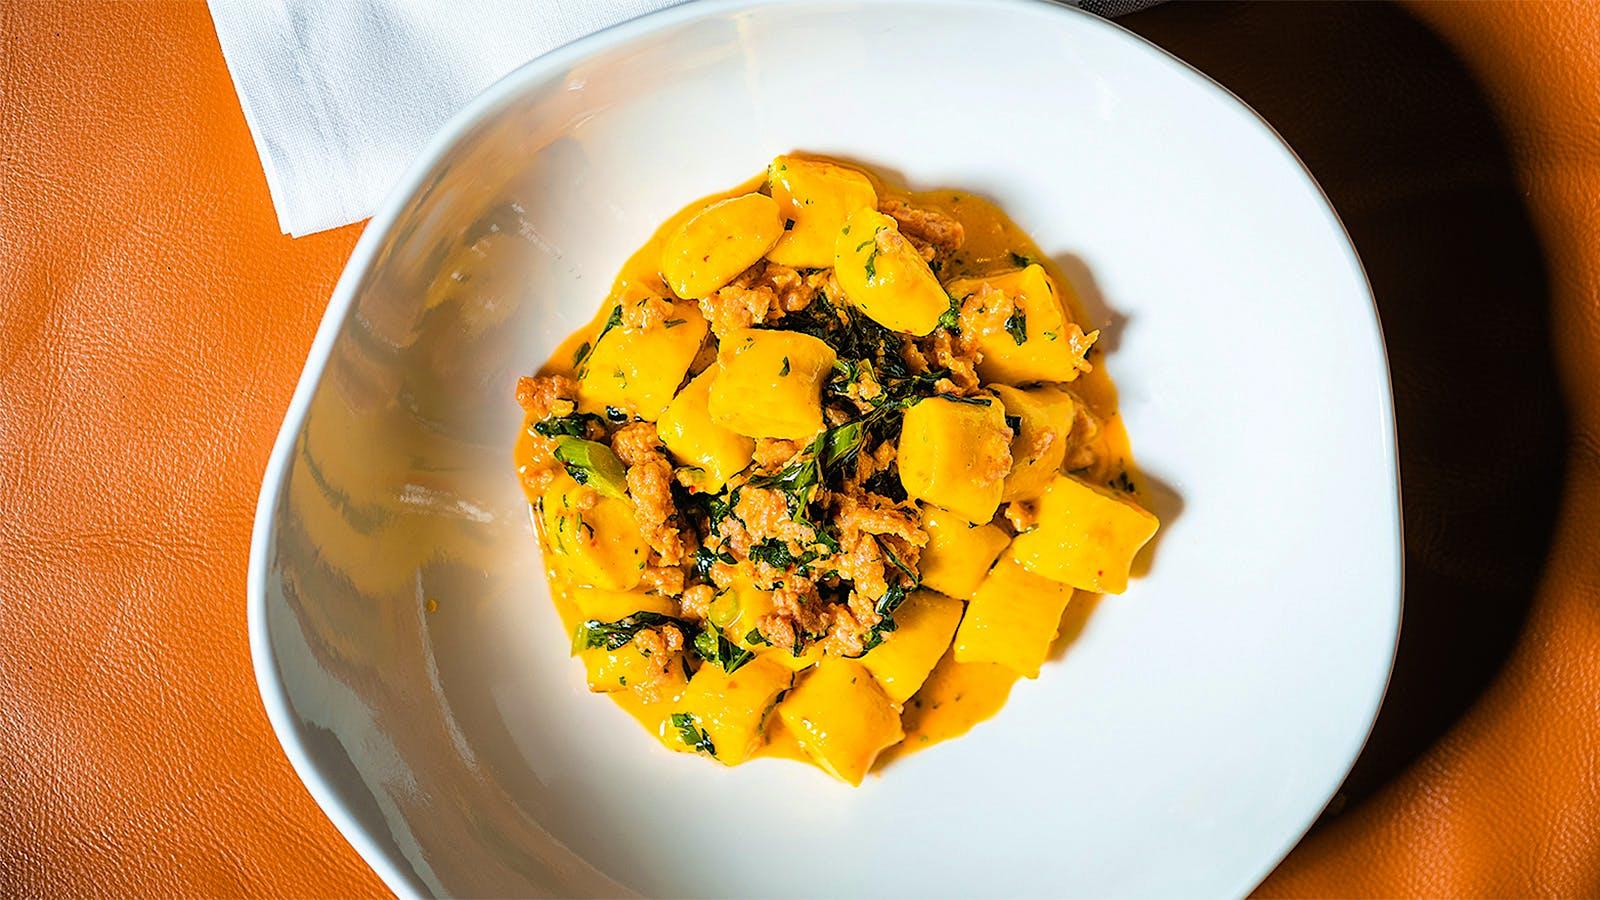 Chef Greg Vernick's Late-Summer Saffron Ricotta Gnocchi with Tuna 'Nduja